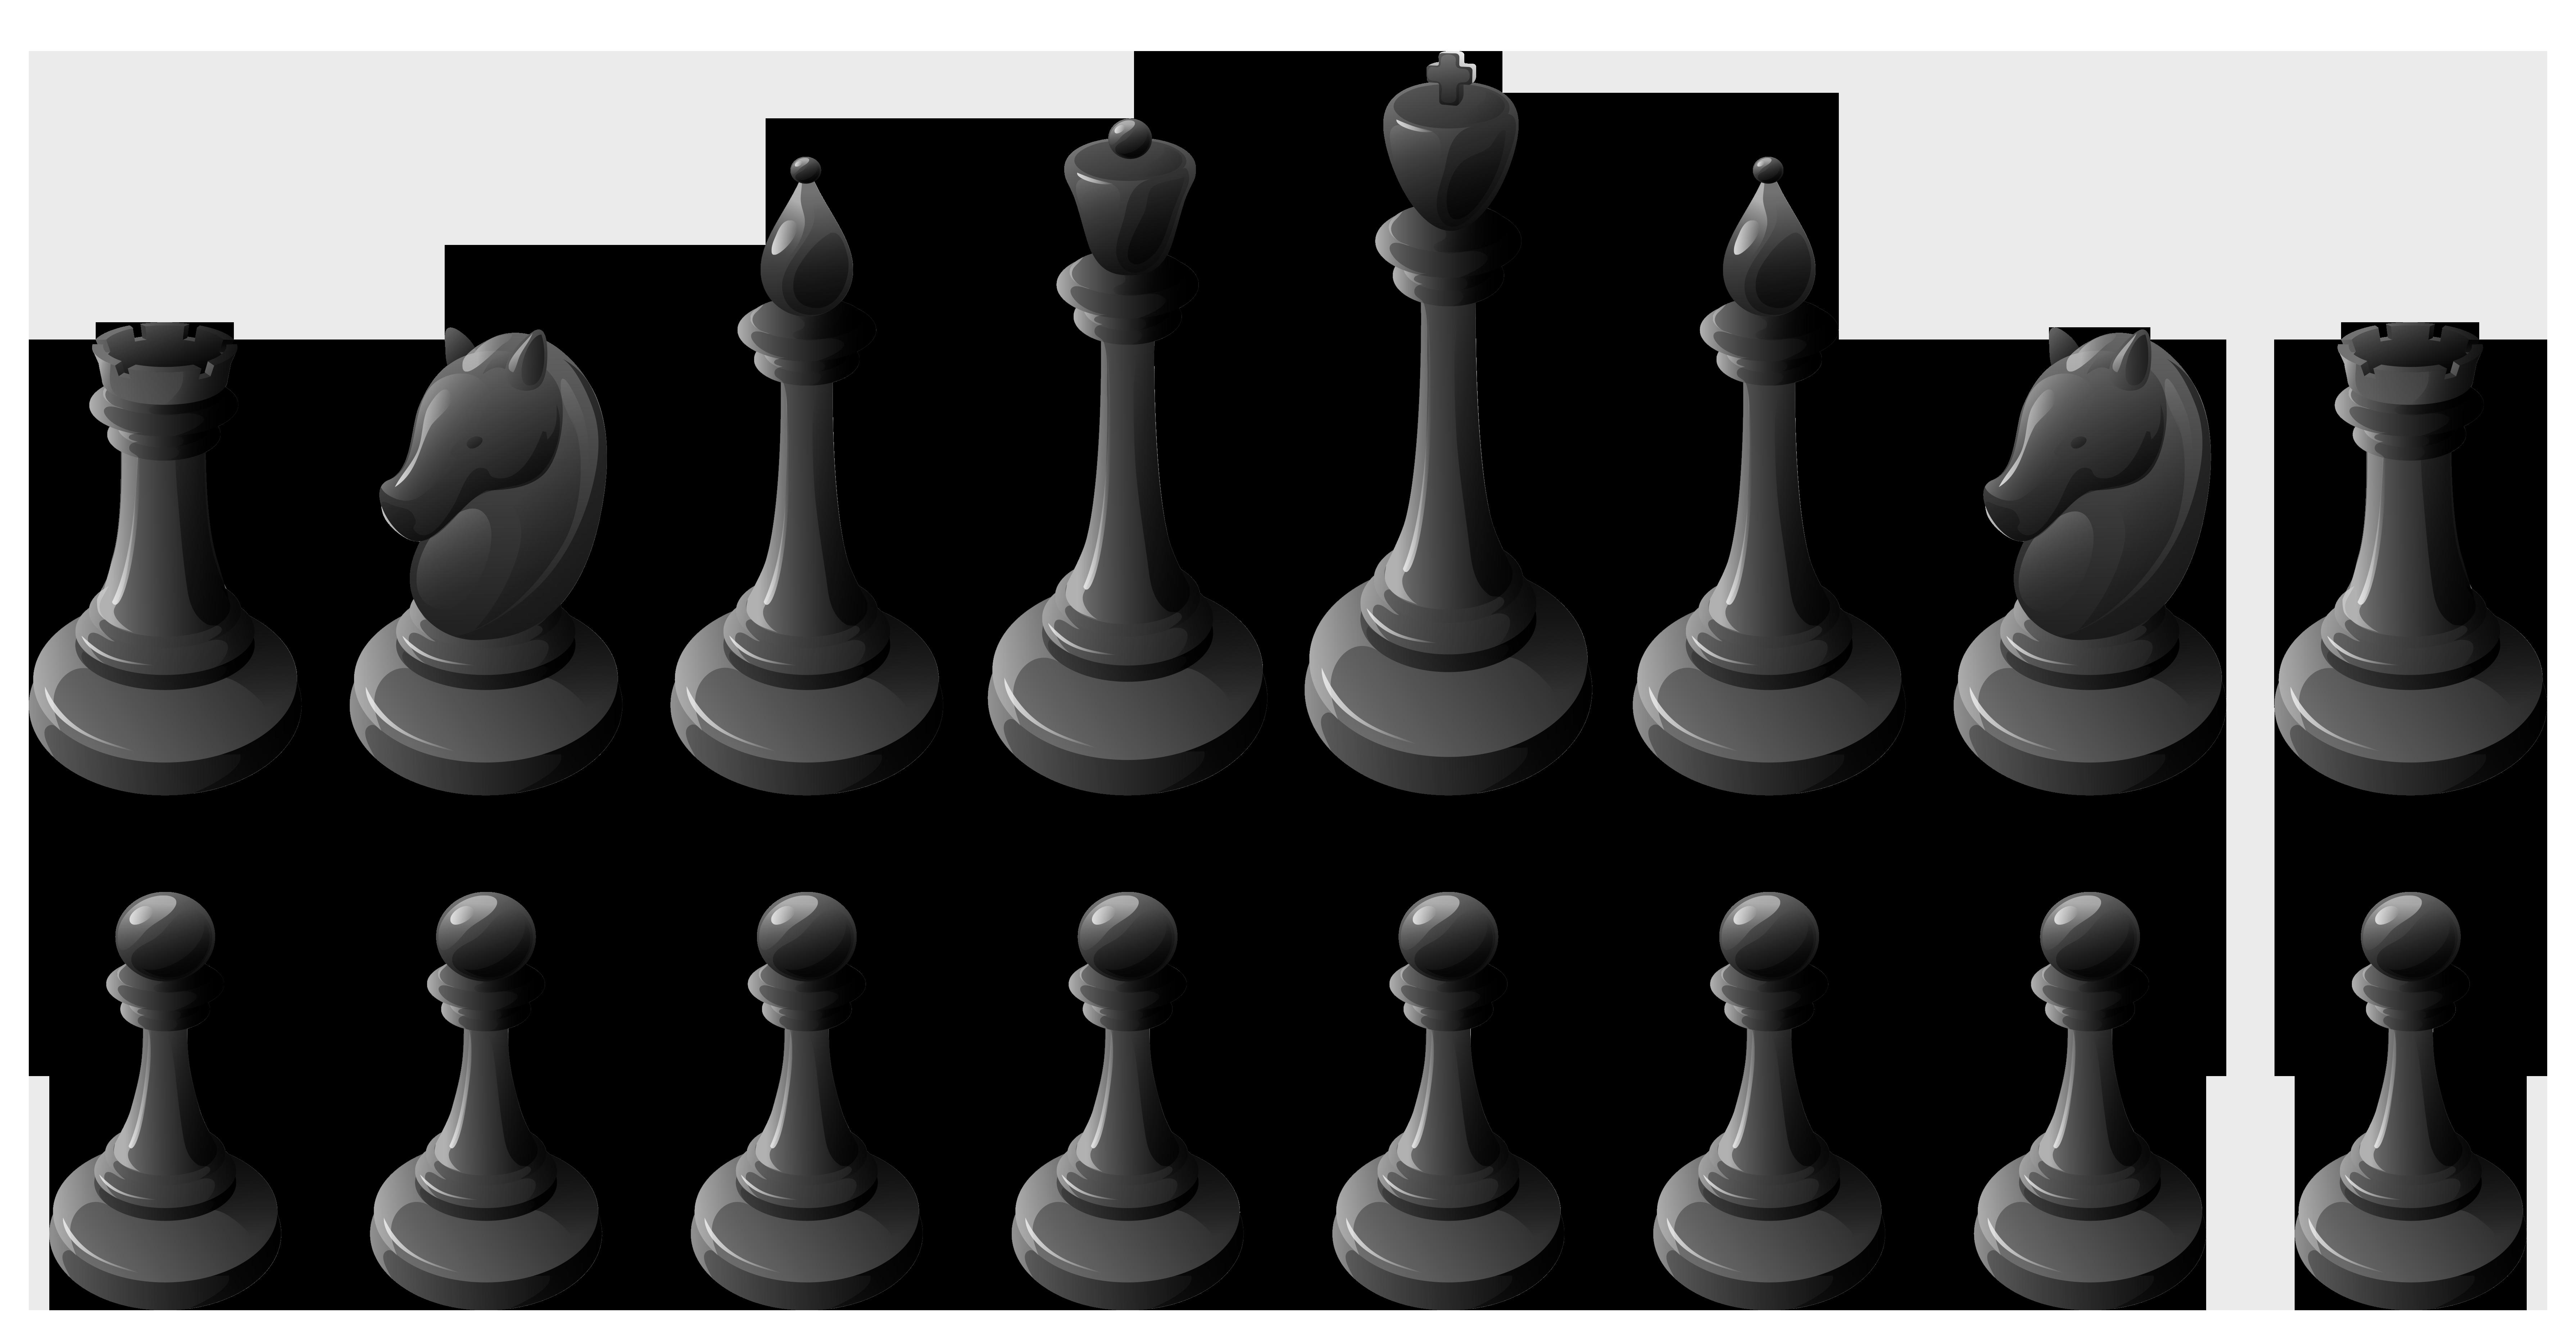 Chess set clipart png transparent stock Black Chess Pieces PNG Clipart - Best WEB Clipart png transparent stock